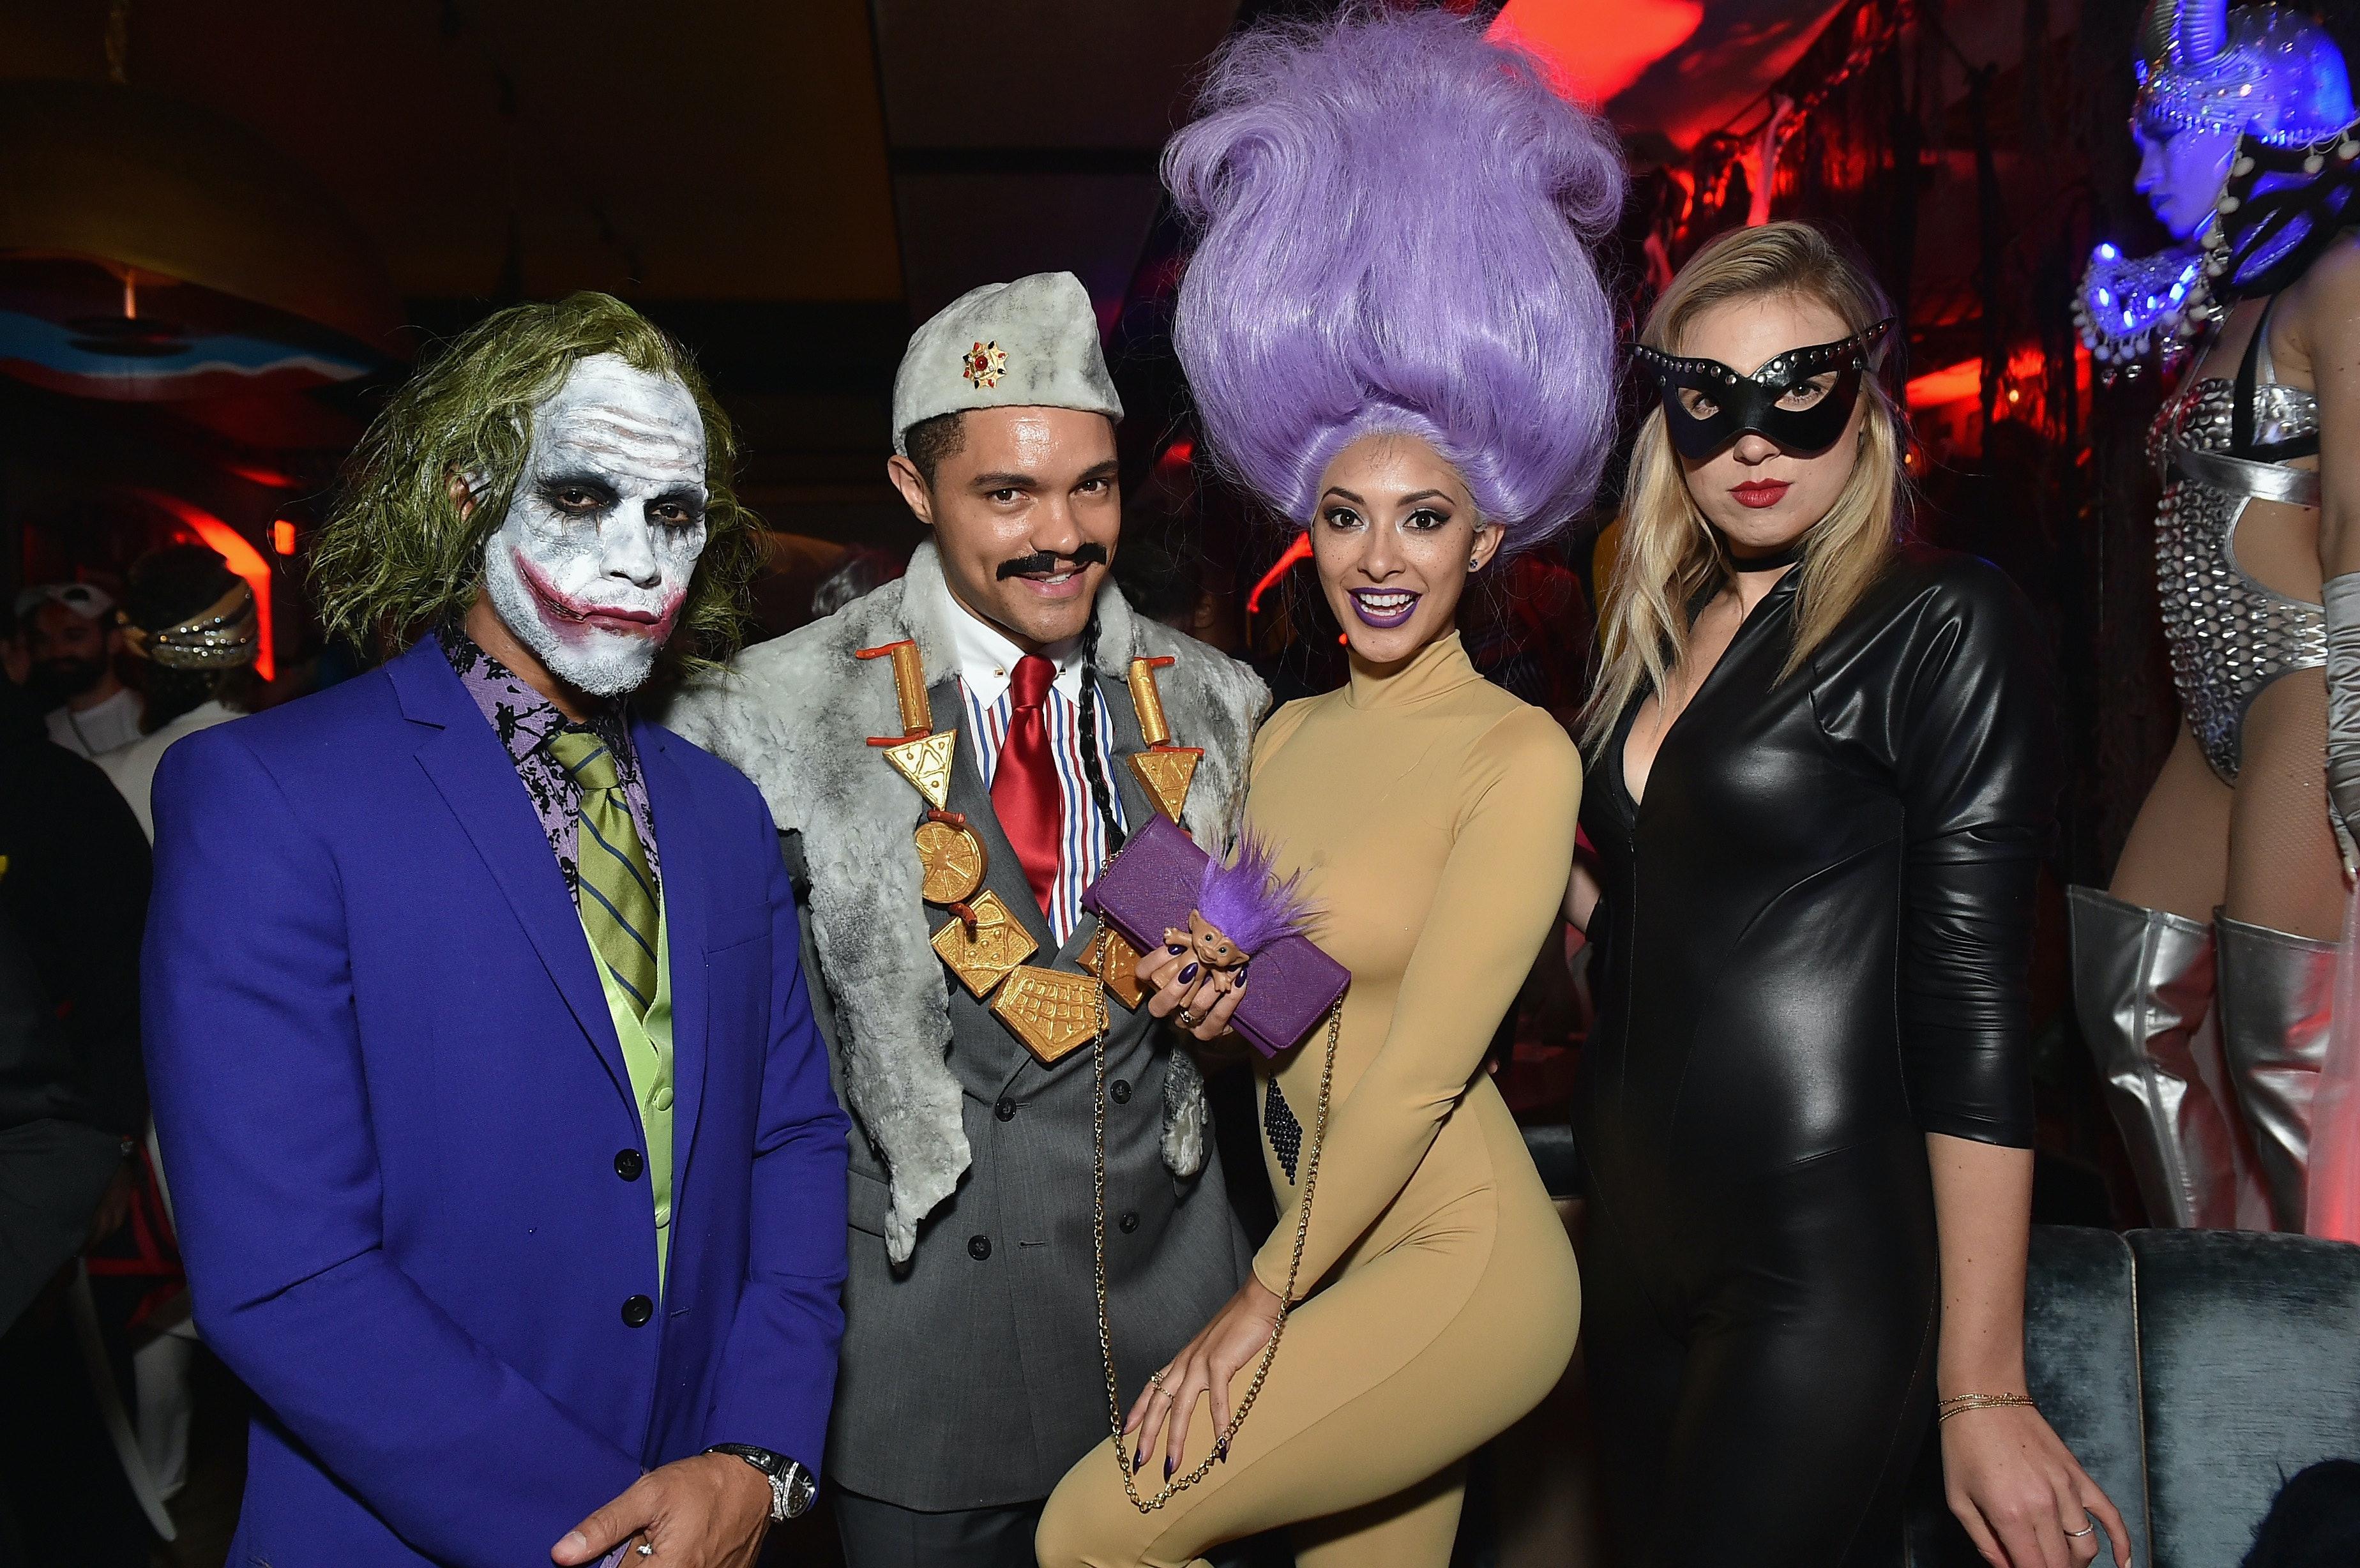 Last Minute Best Friend Halloween 2017 Costume Ideas That Are Still Super Creative  sc 1 st  Bustle & Last Minute Best Friend Halloween 2017 Costume Ideas That Are Still ...